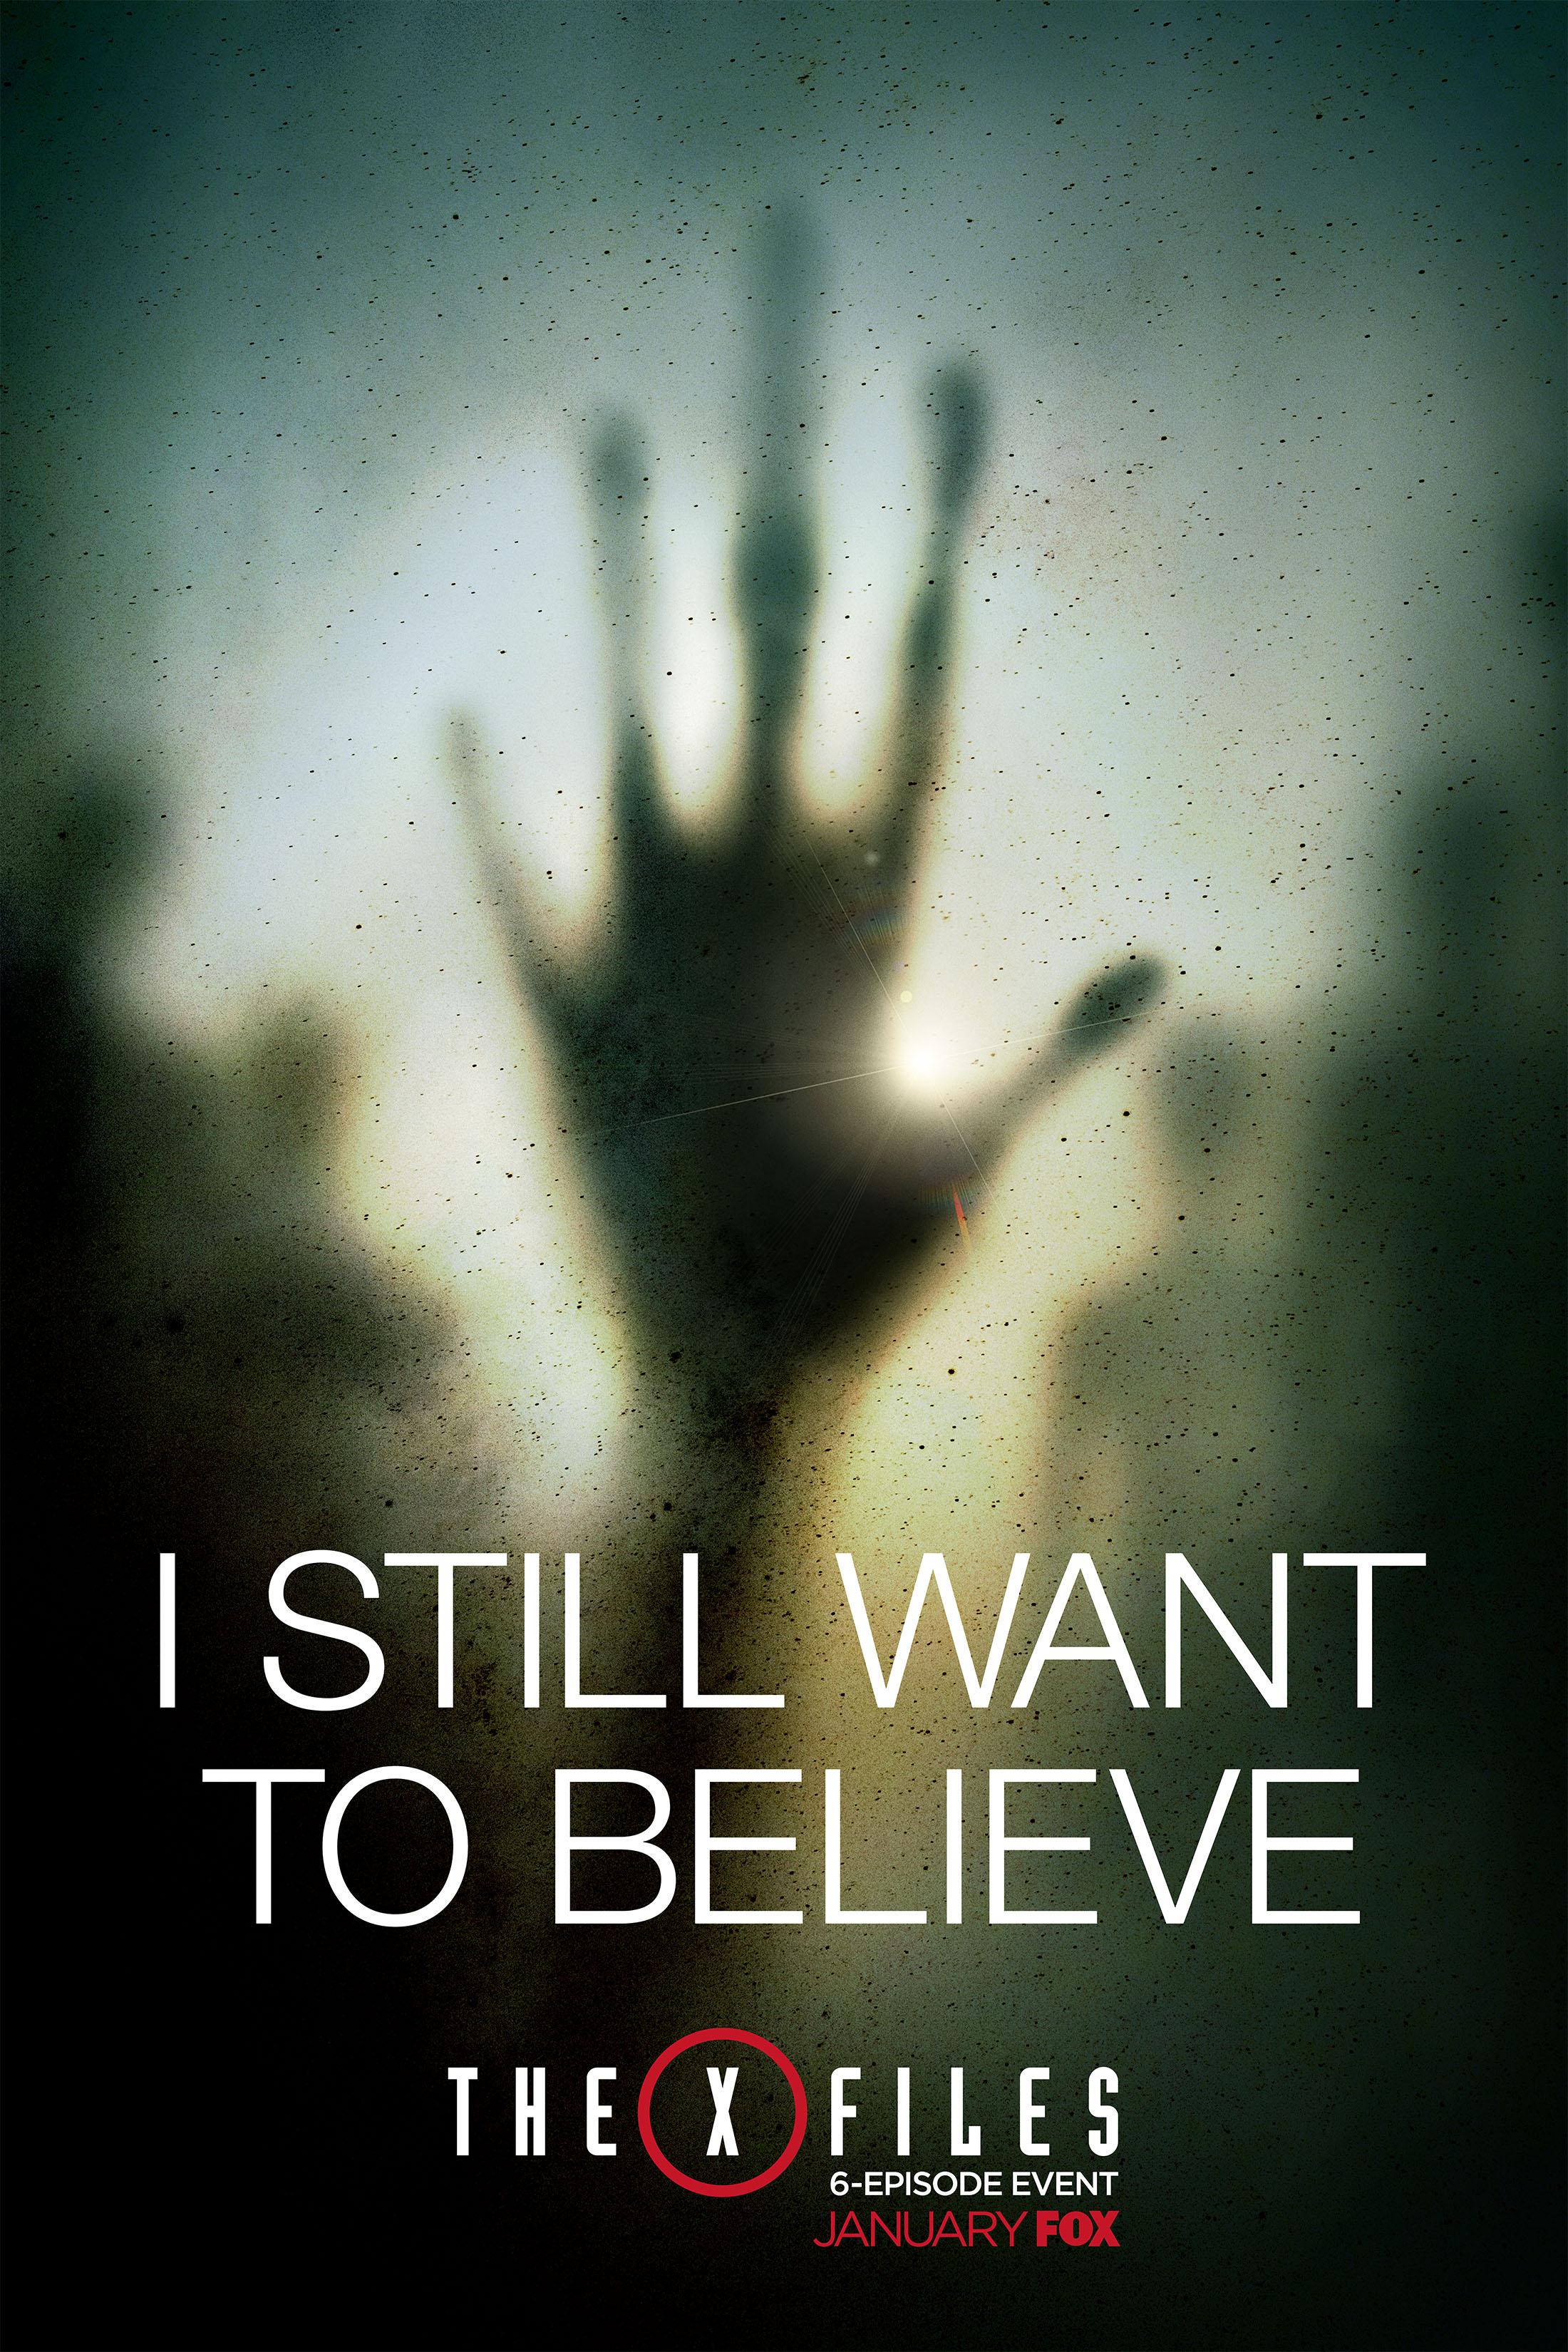 X-Files I Still Want To Believe (2016).jpg